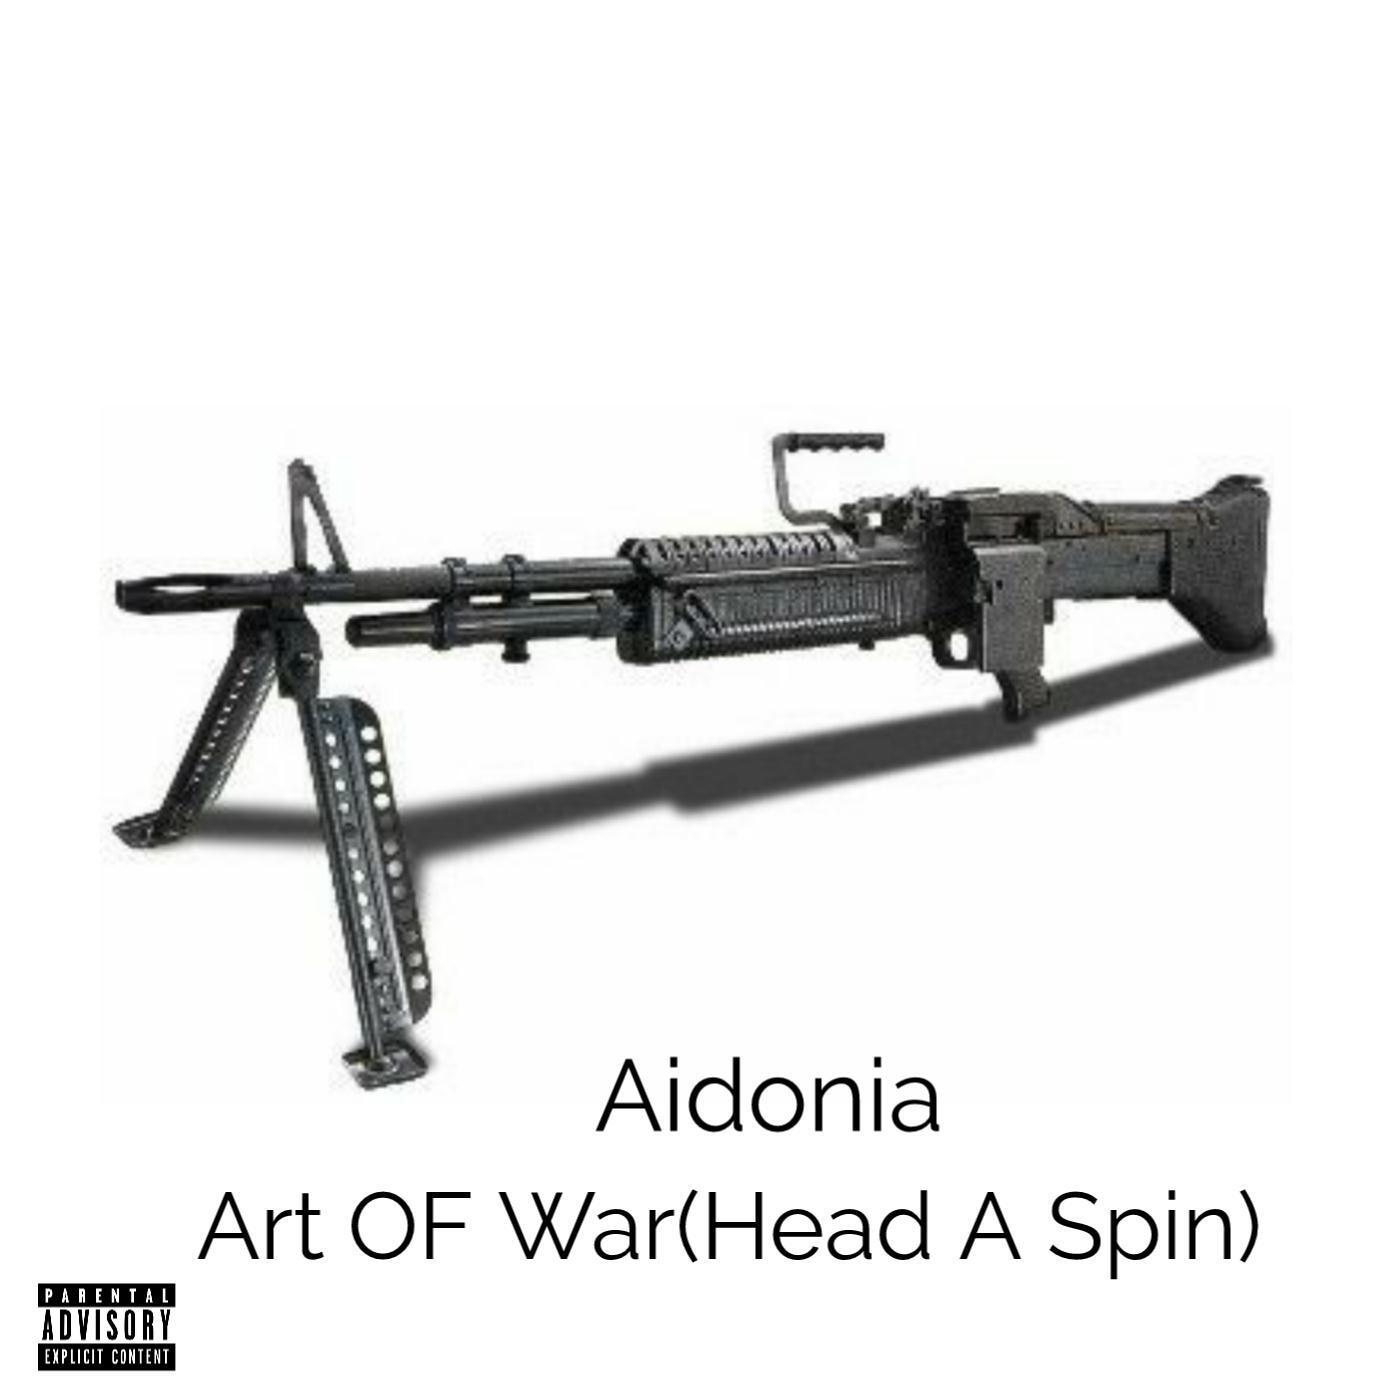 aidonia nuh empty gun